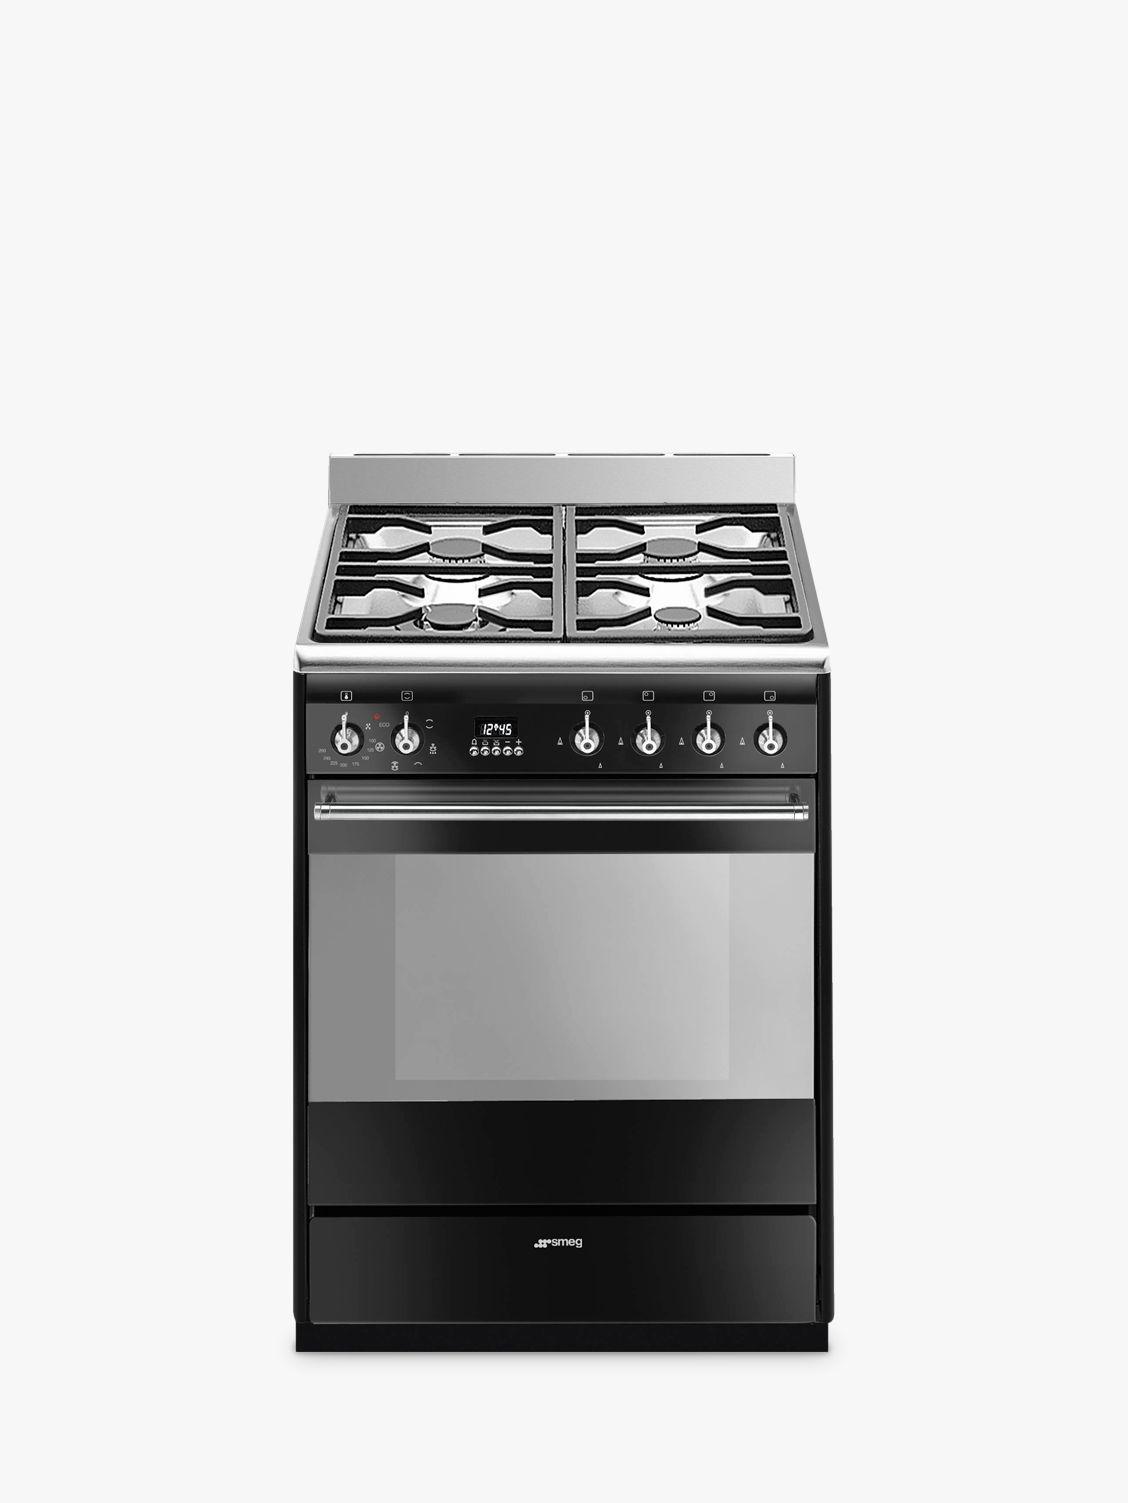 Smeg SUK61MBL9 60cm Dual Fuel Cooker, A Energy Rating, Black